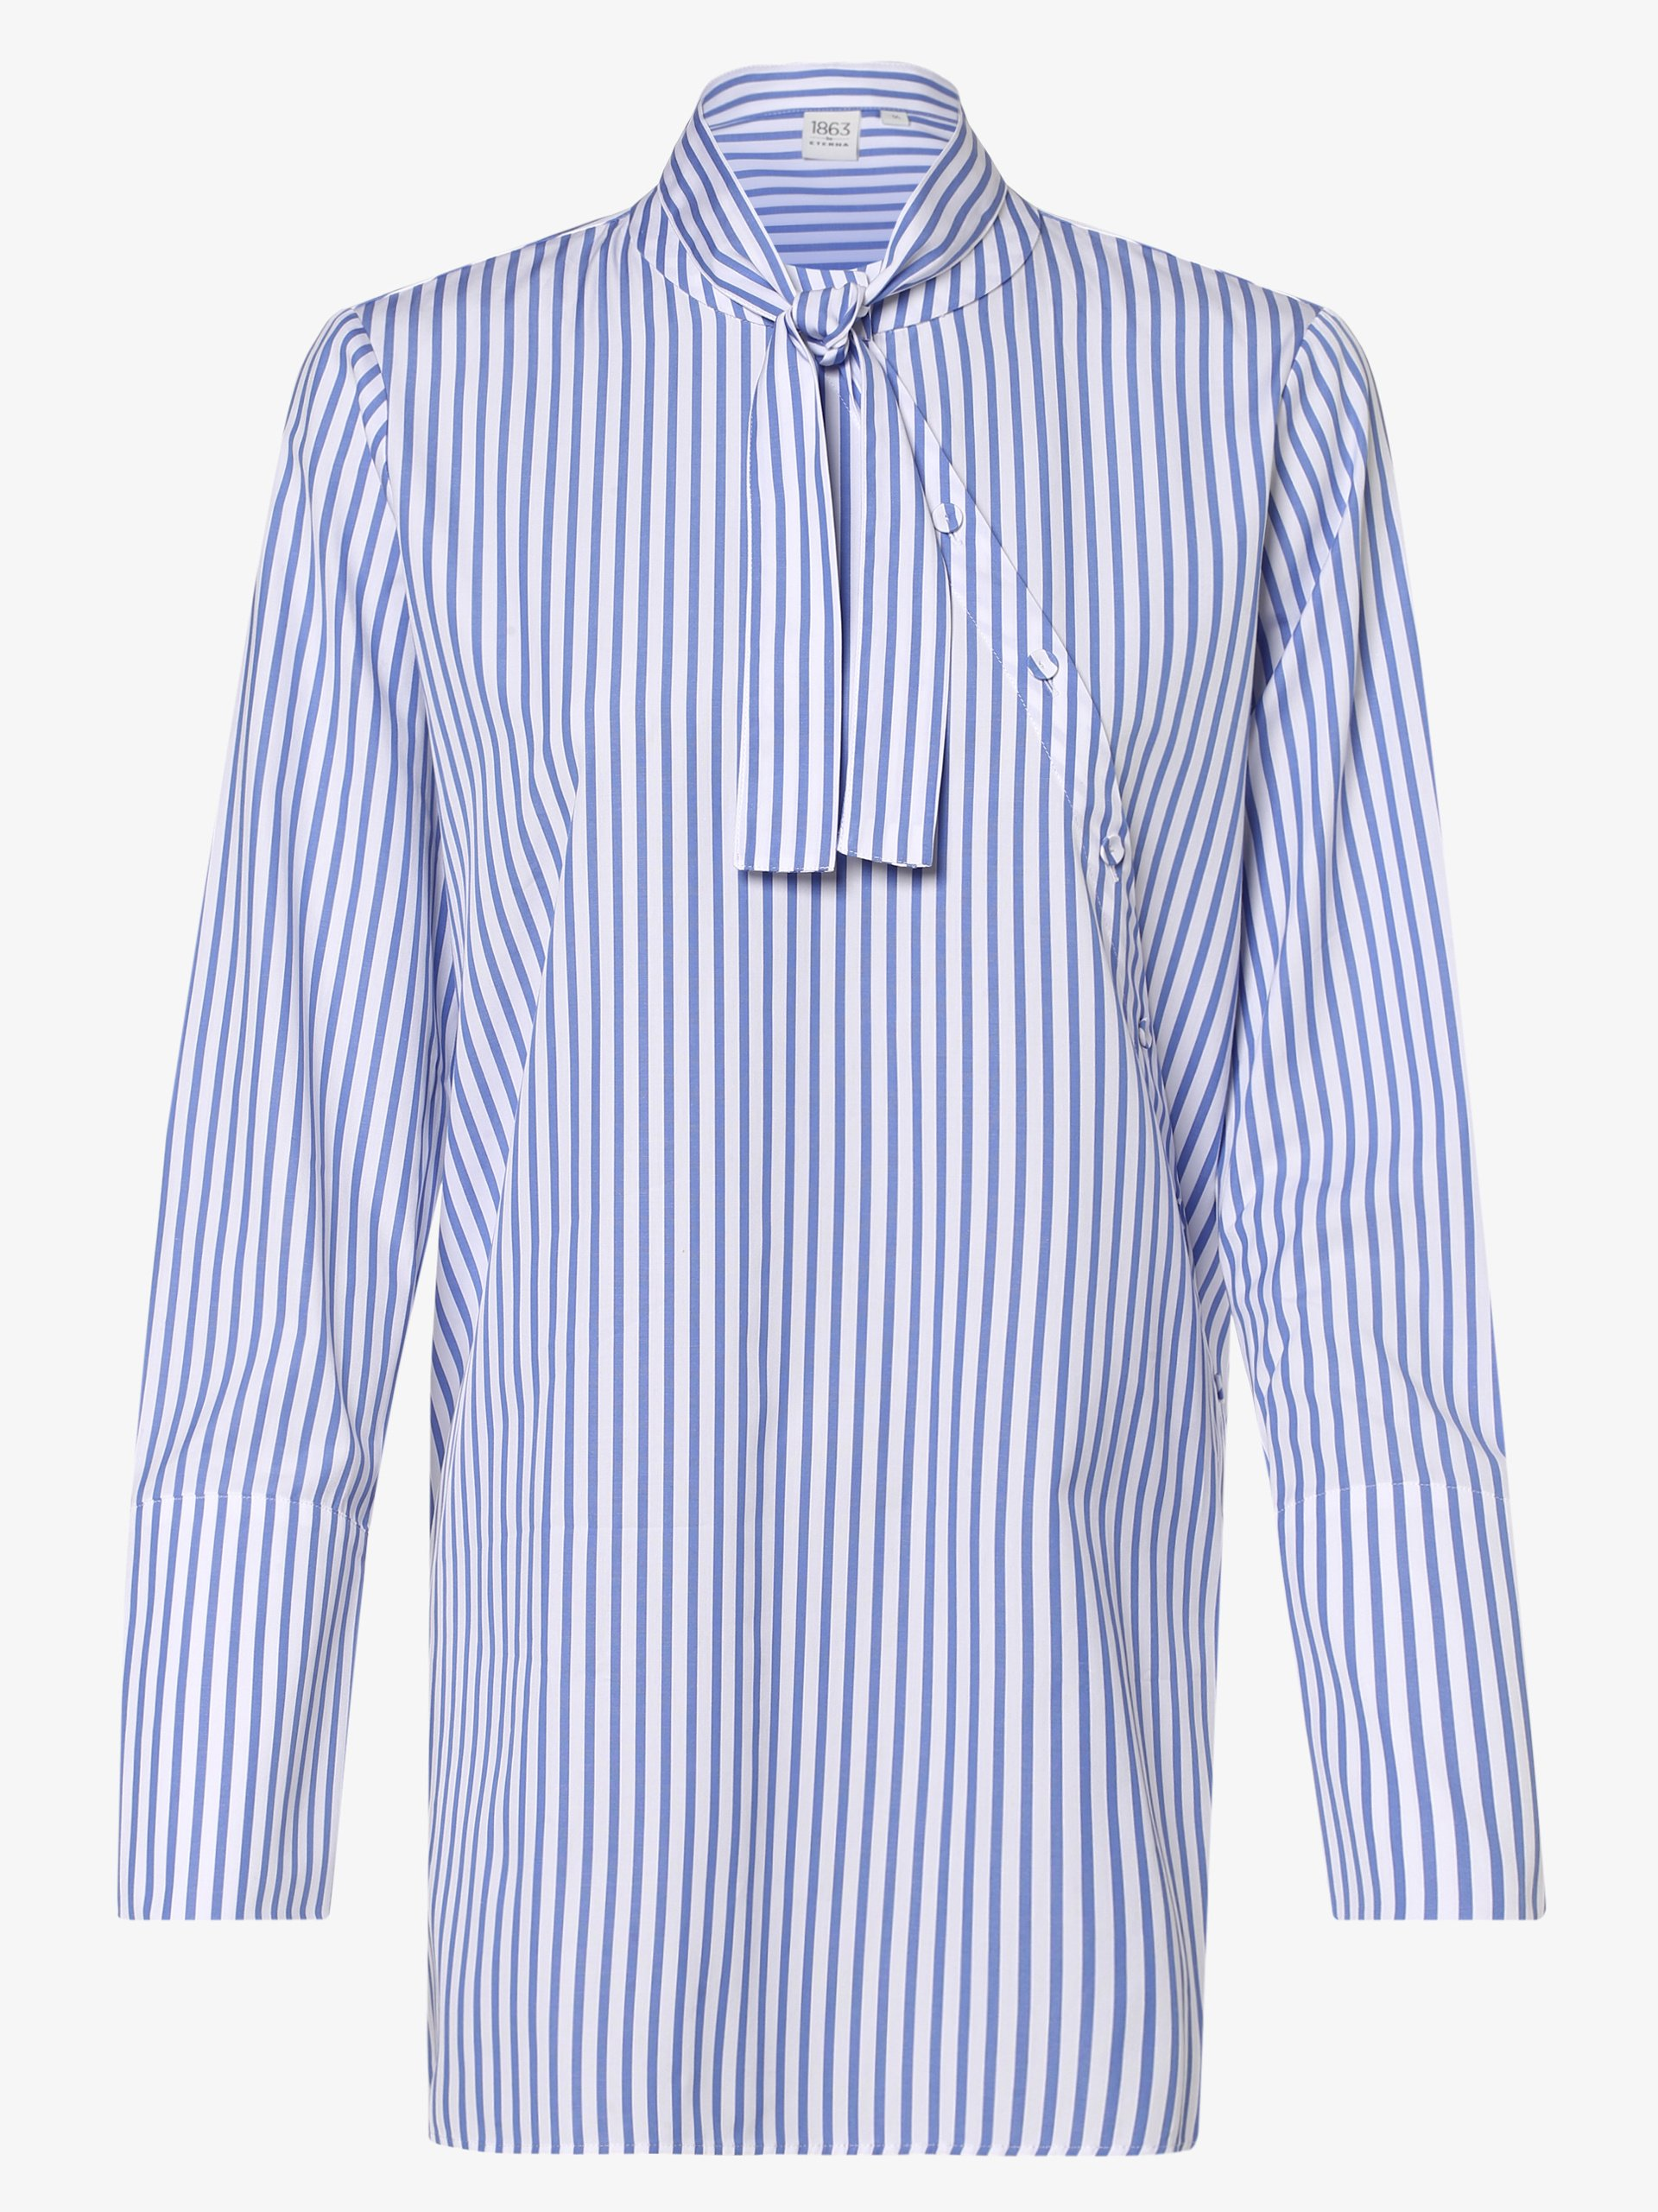 Eterna Premium Bluzka damska – łatwa w prasowaniu